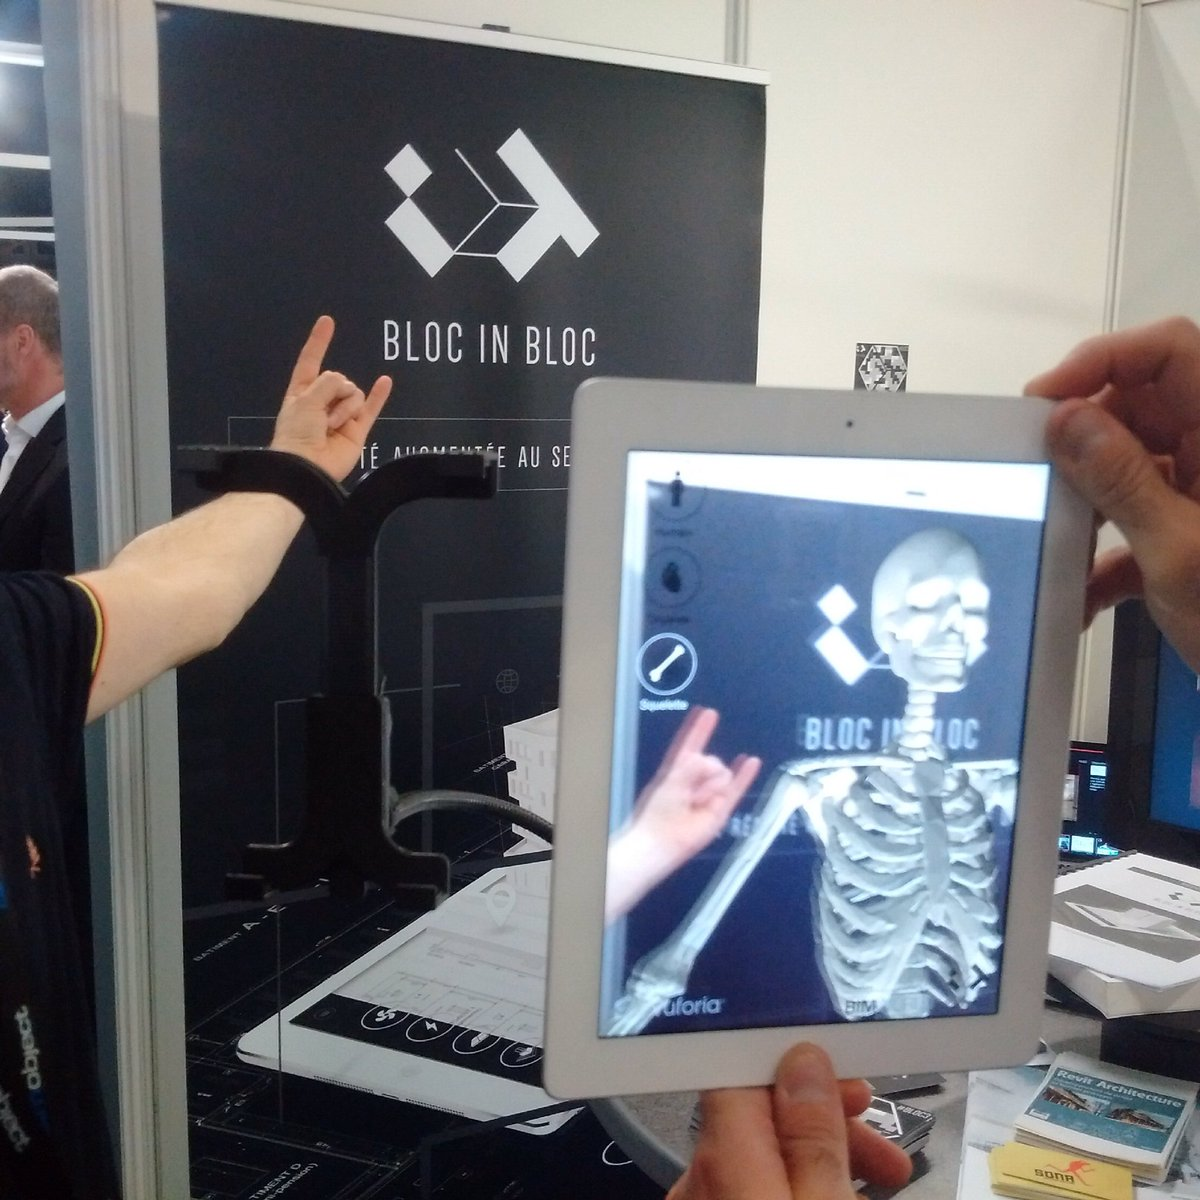 La startup de #Nantes @Blocinblocteam tease la programmation du @hellfestopenair au @bimworld Paris ! #hellfest #BIMworld<br>http://pic.twitter.com/LA3mvIpFrI